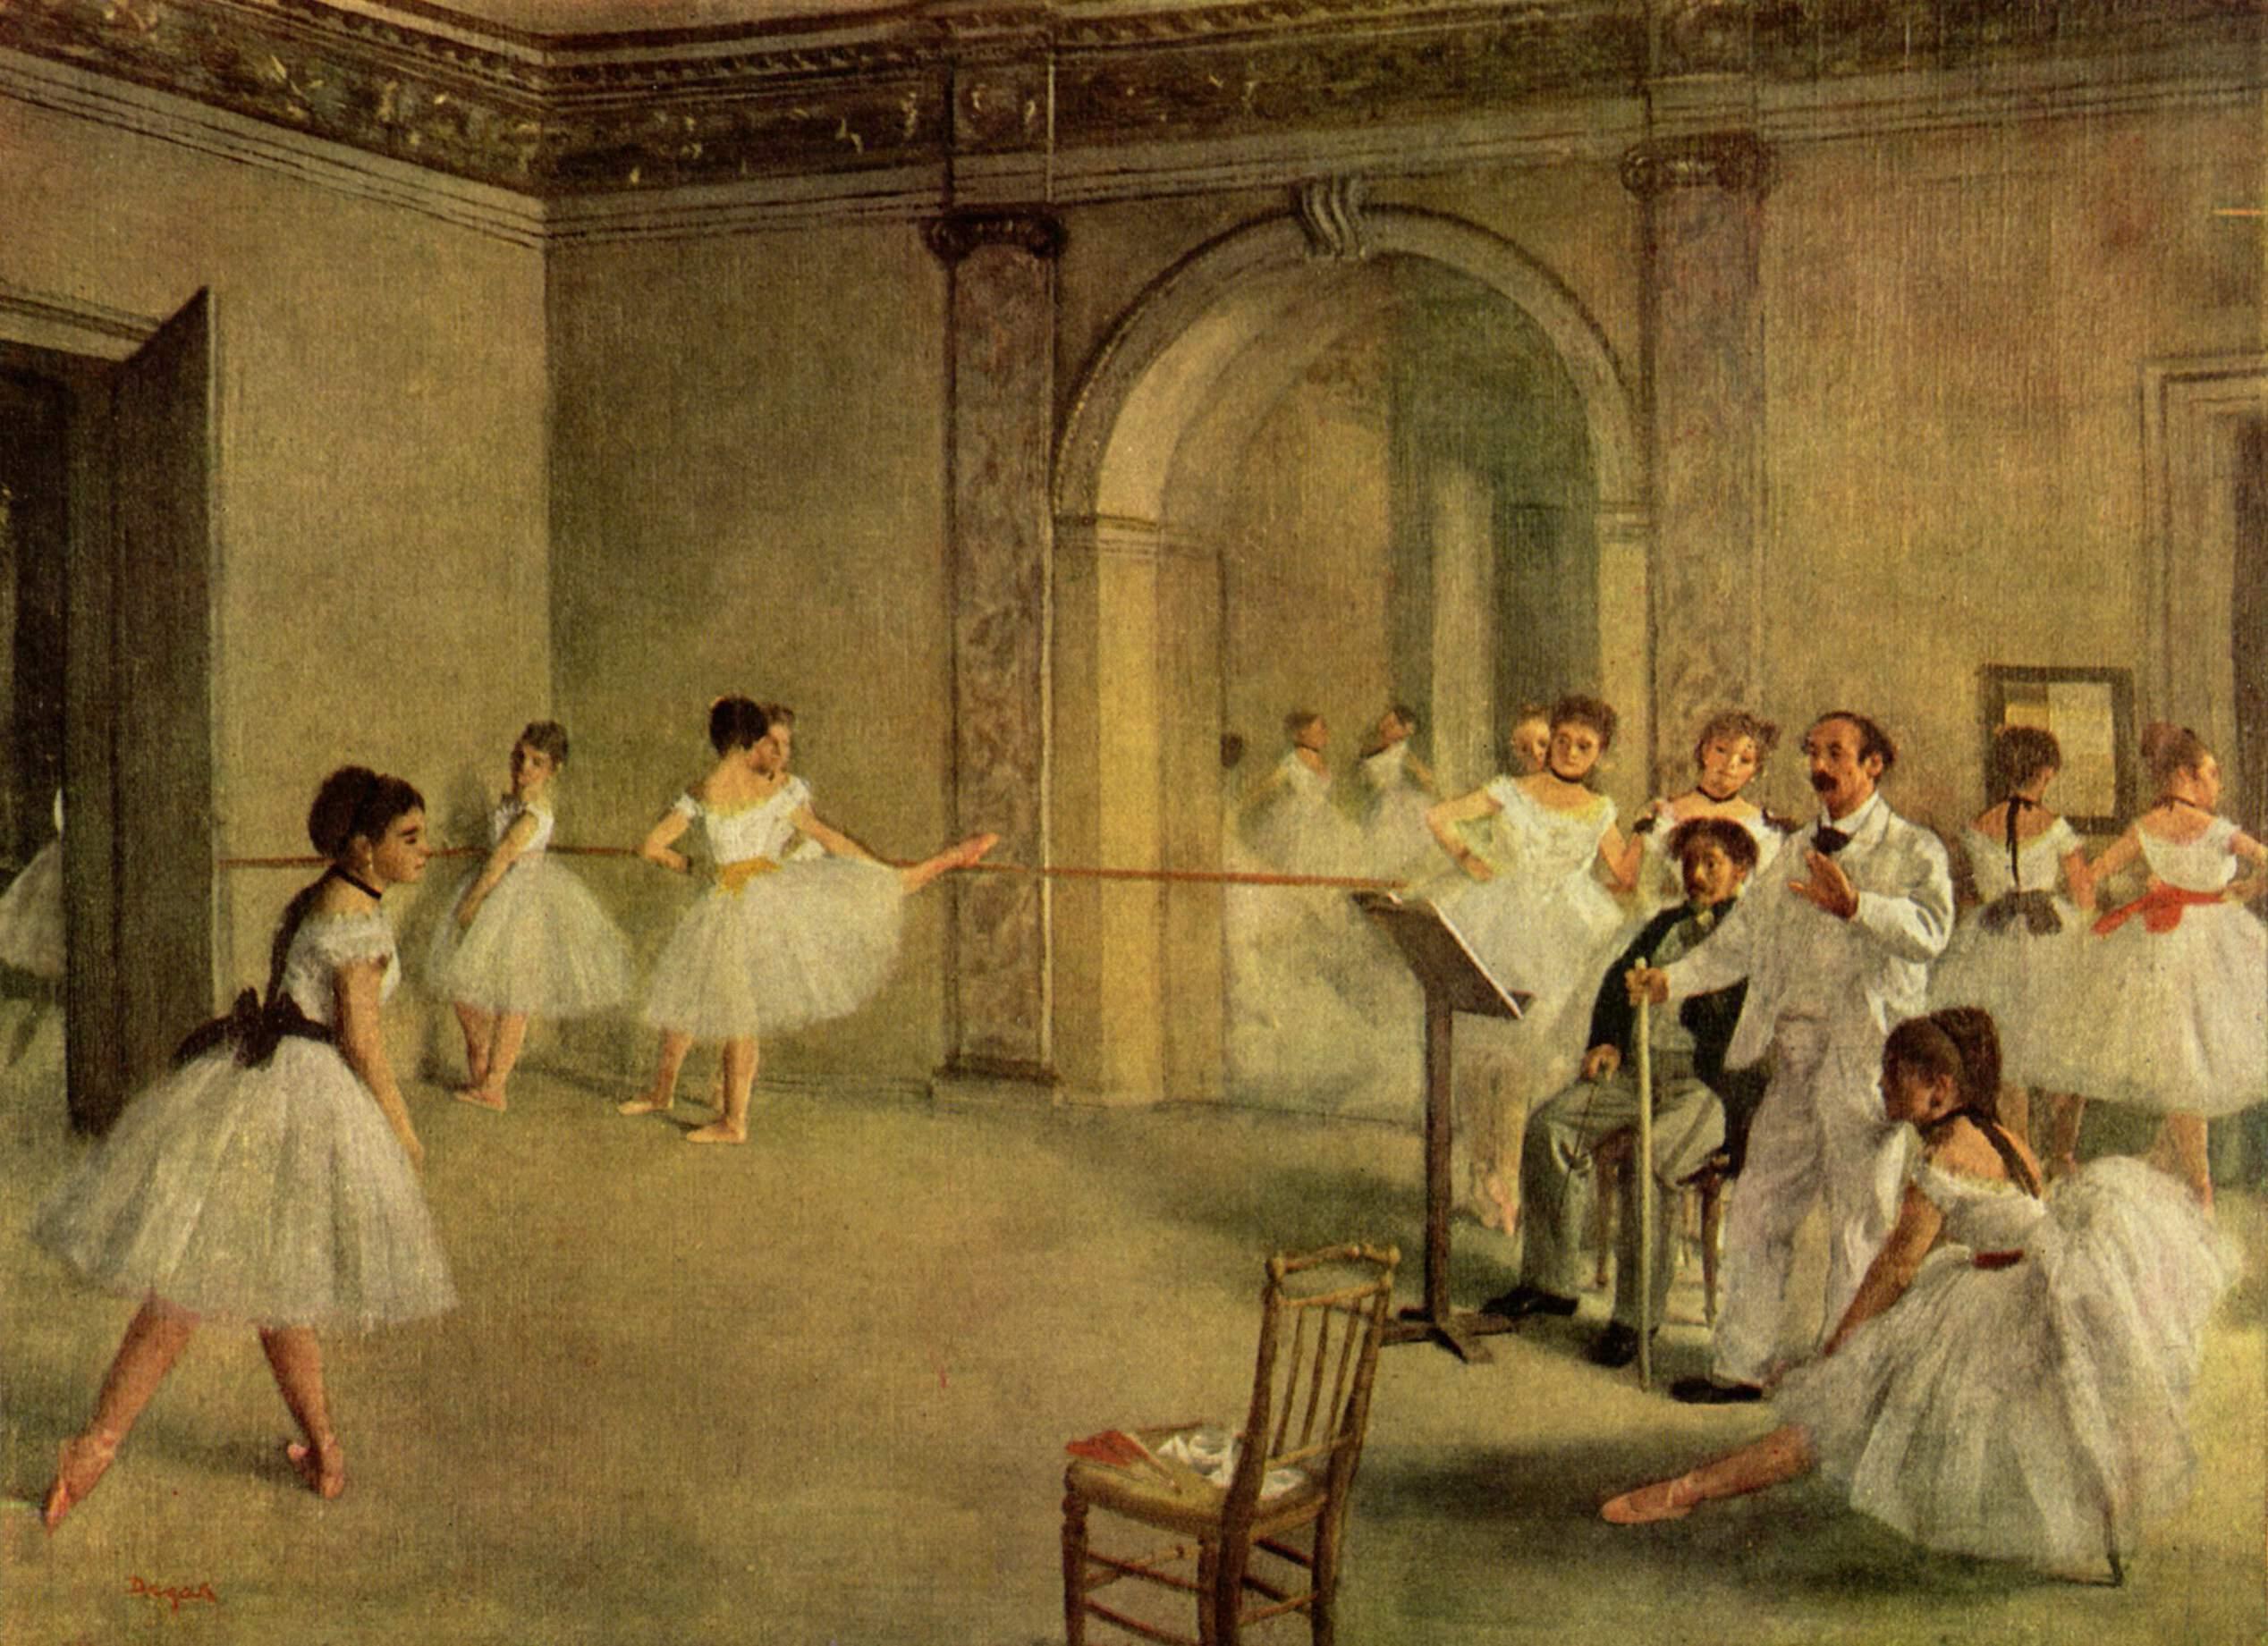 Балетный класс Оперы на улице Пелетье, Эдгар-Жермен - Илер Дега